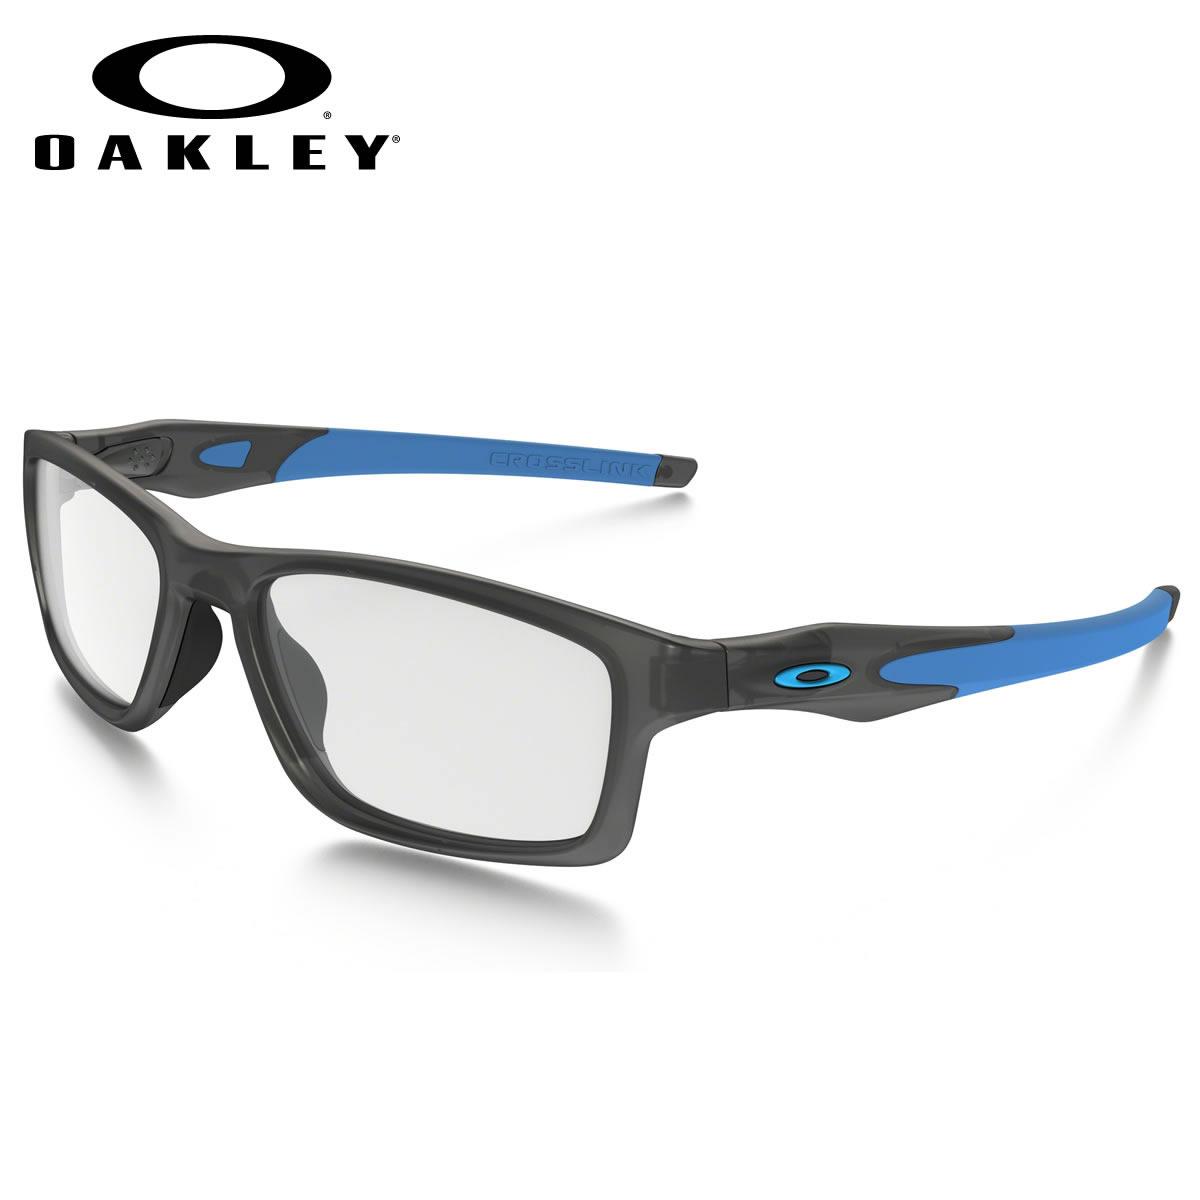 Optical Shop Thats | Rakuten Global Market: -OAKLEY glasses OX8090 ...